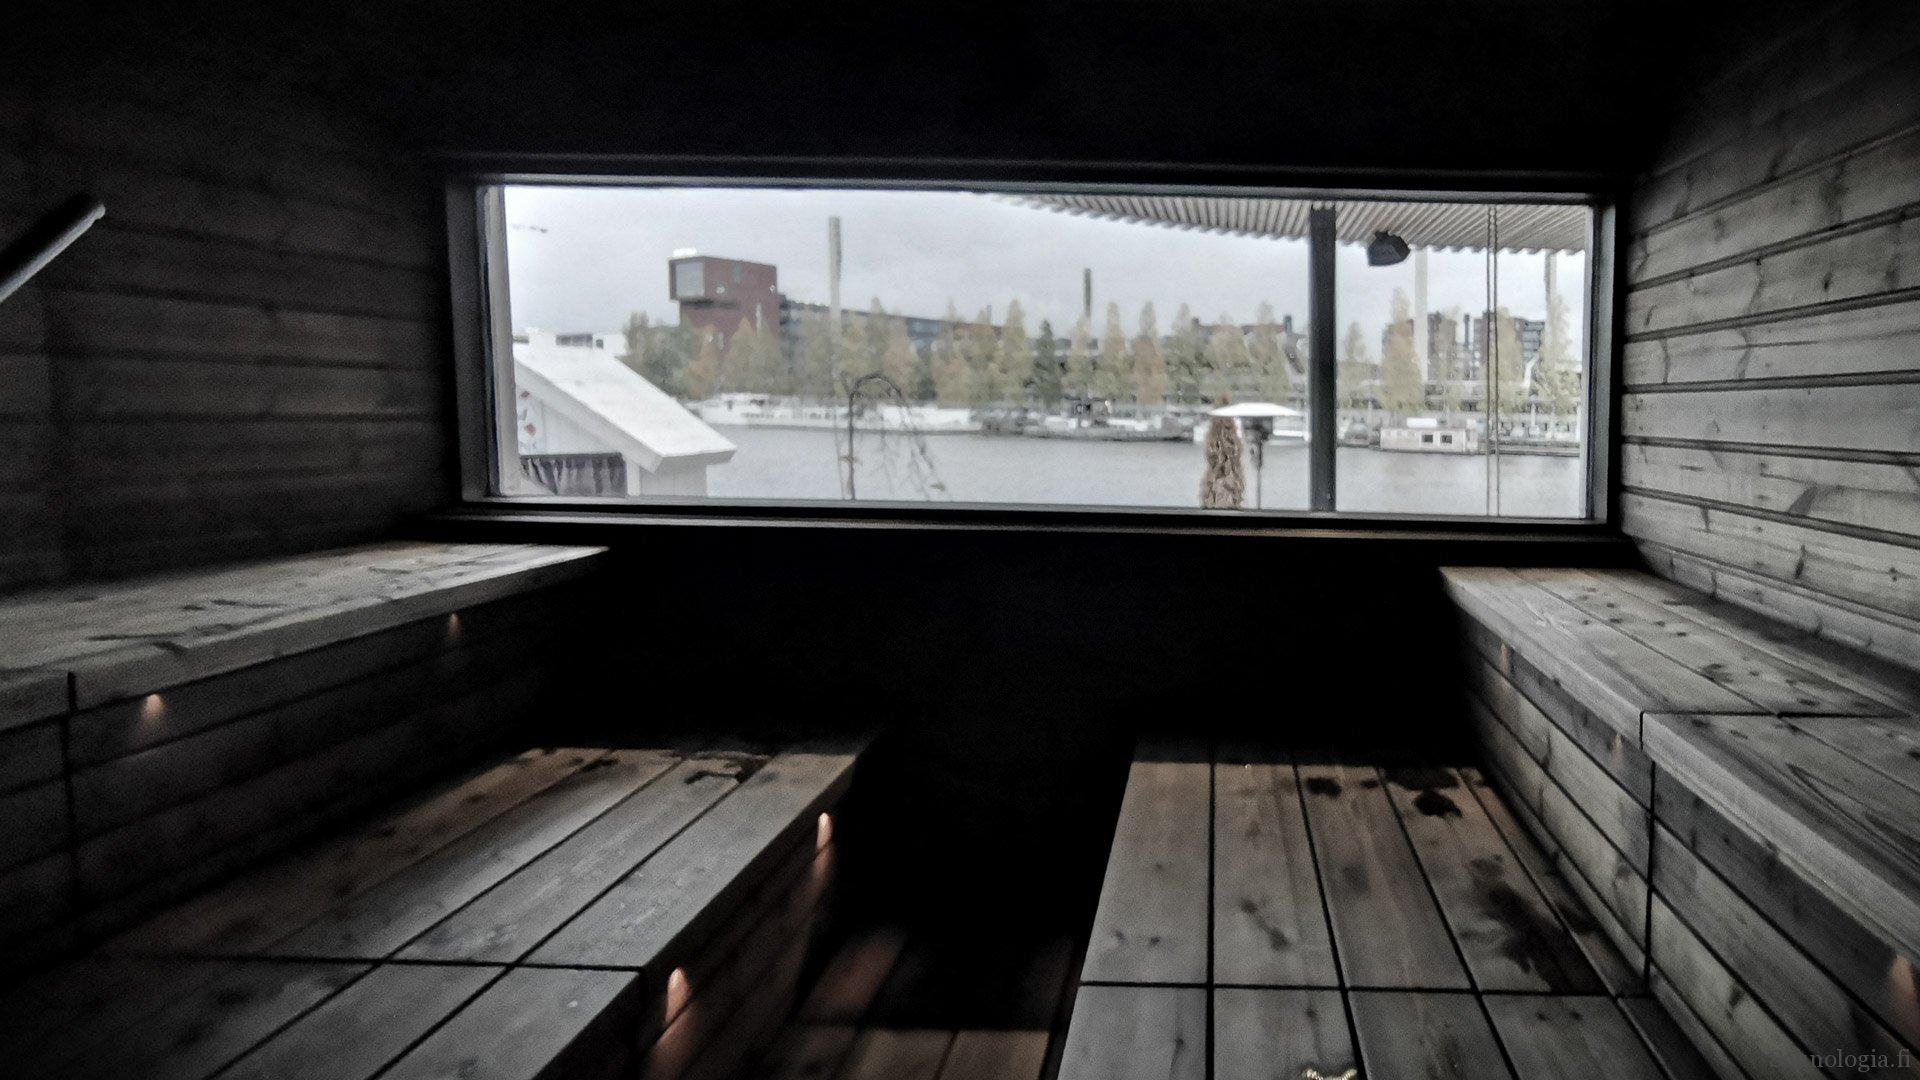 191006-kuuma-saunaravintola-ikkuna-180149